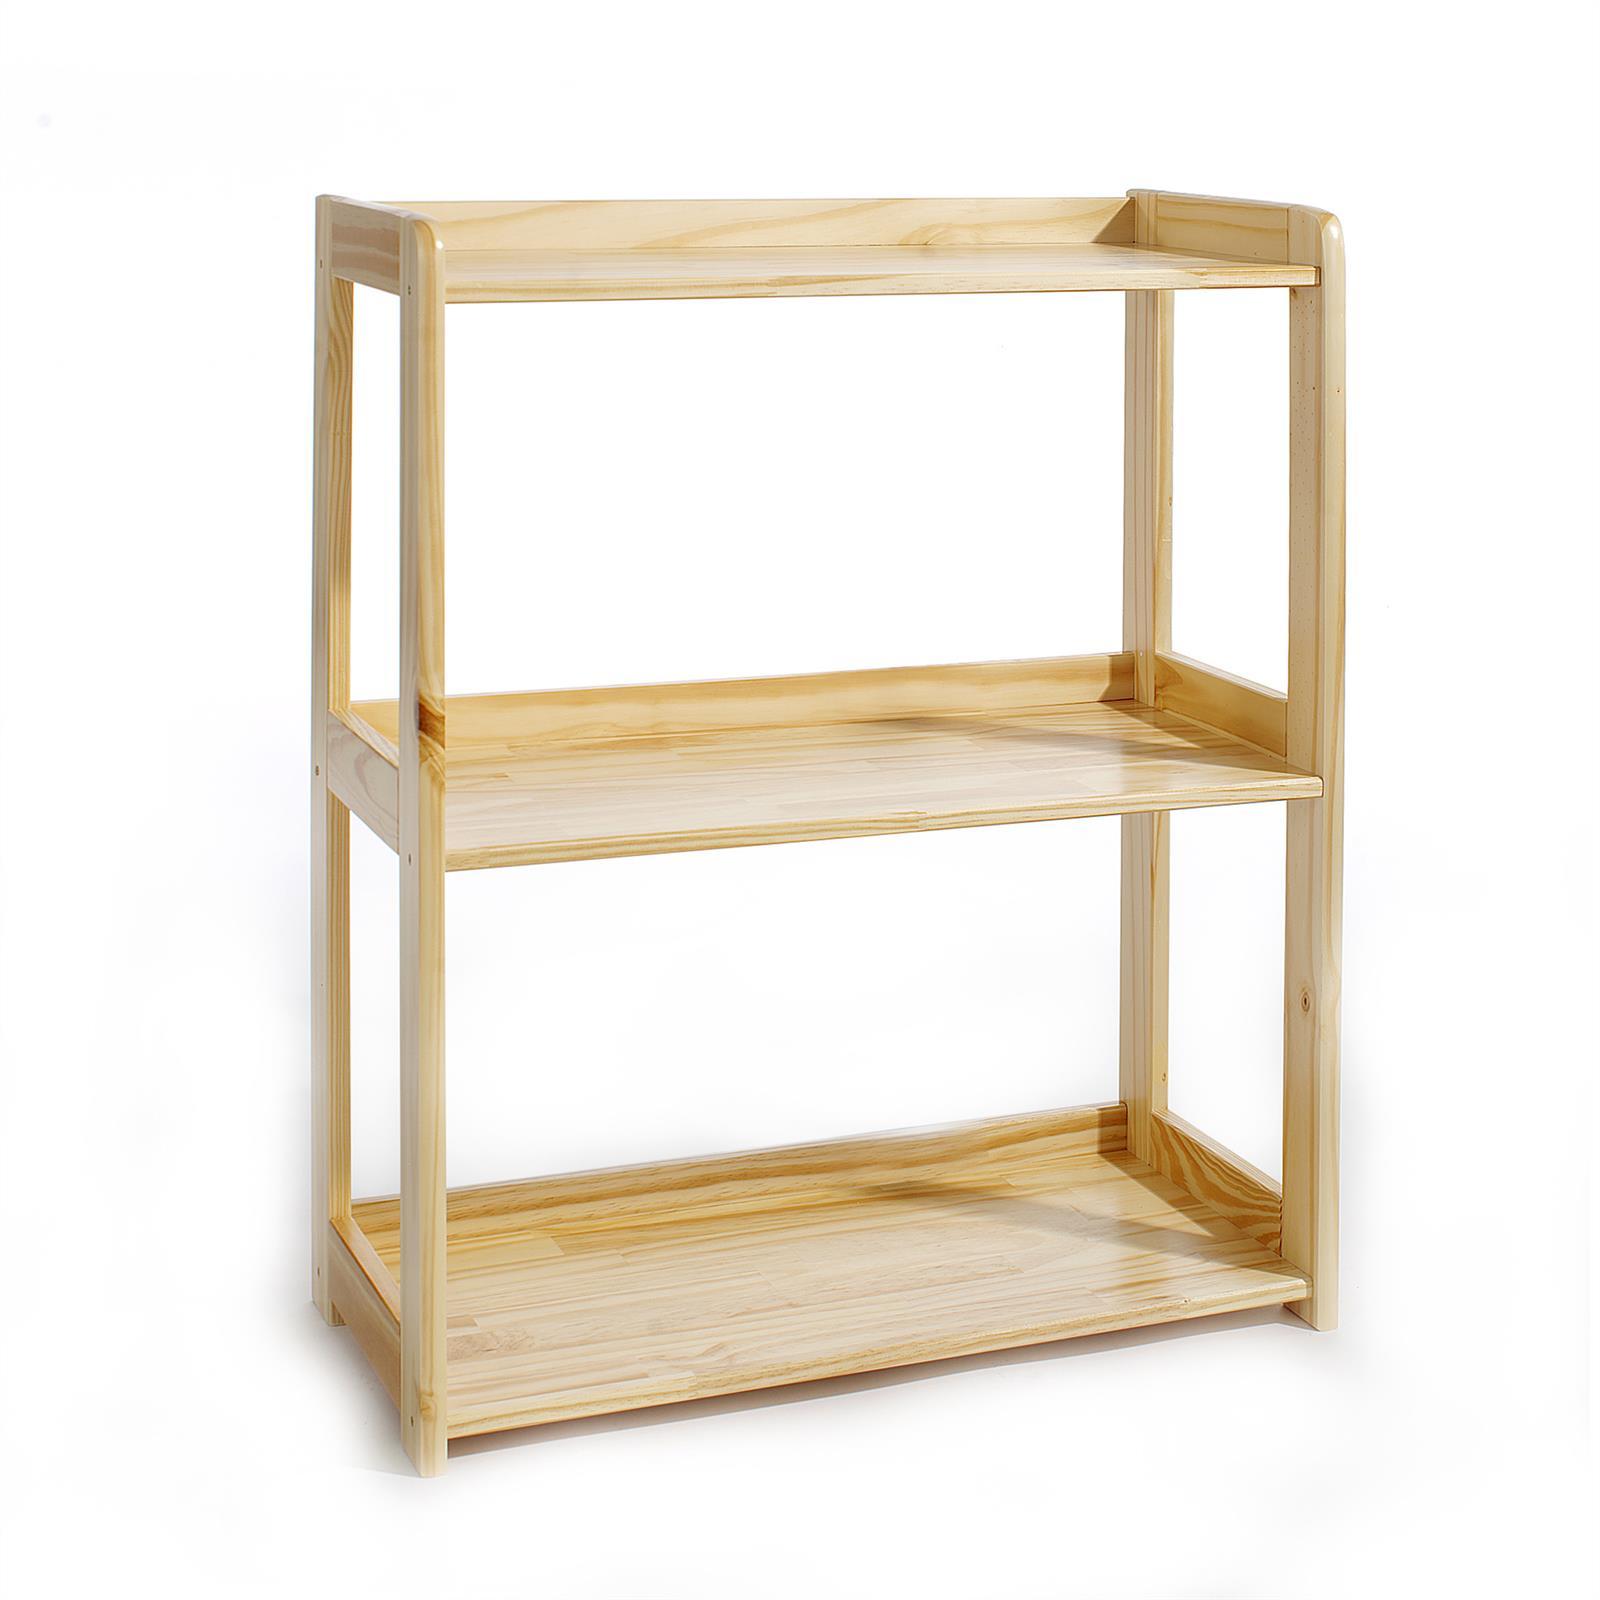 regal b cherregal standregal 3 b den kiefer natur ebay. Black Bedroom Furniture Sets. Home Design Ideas